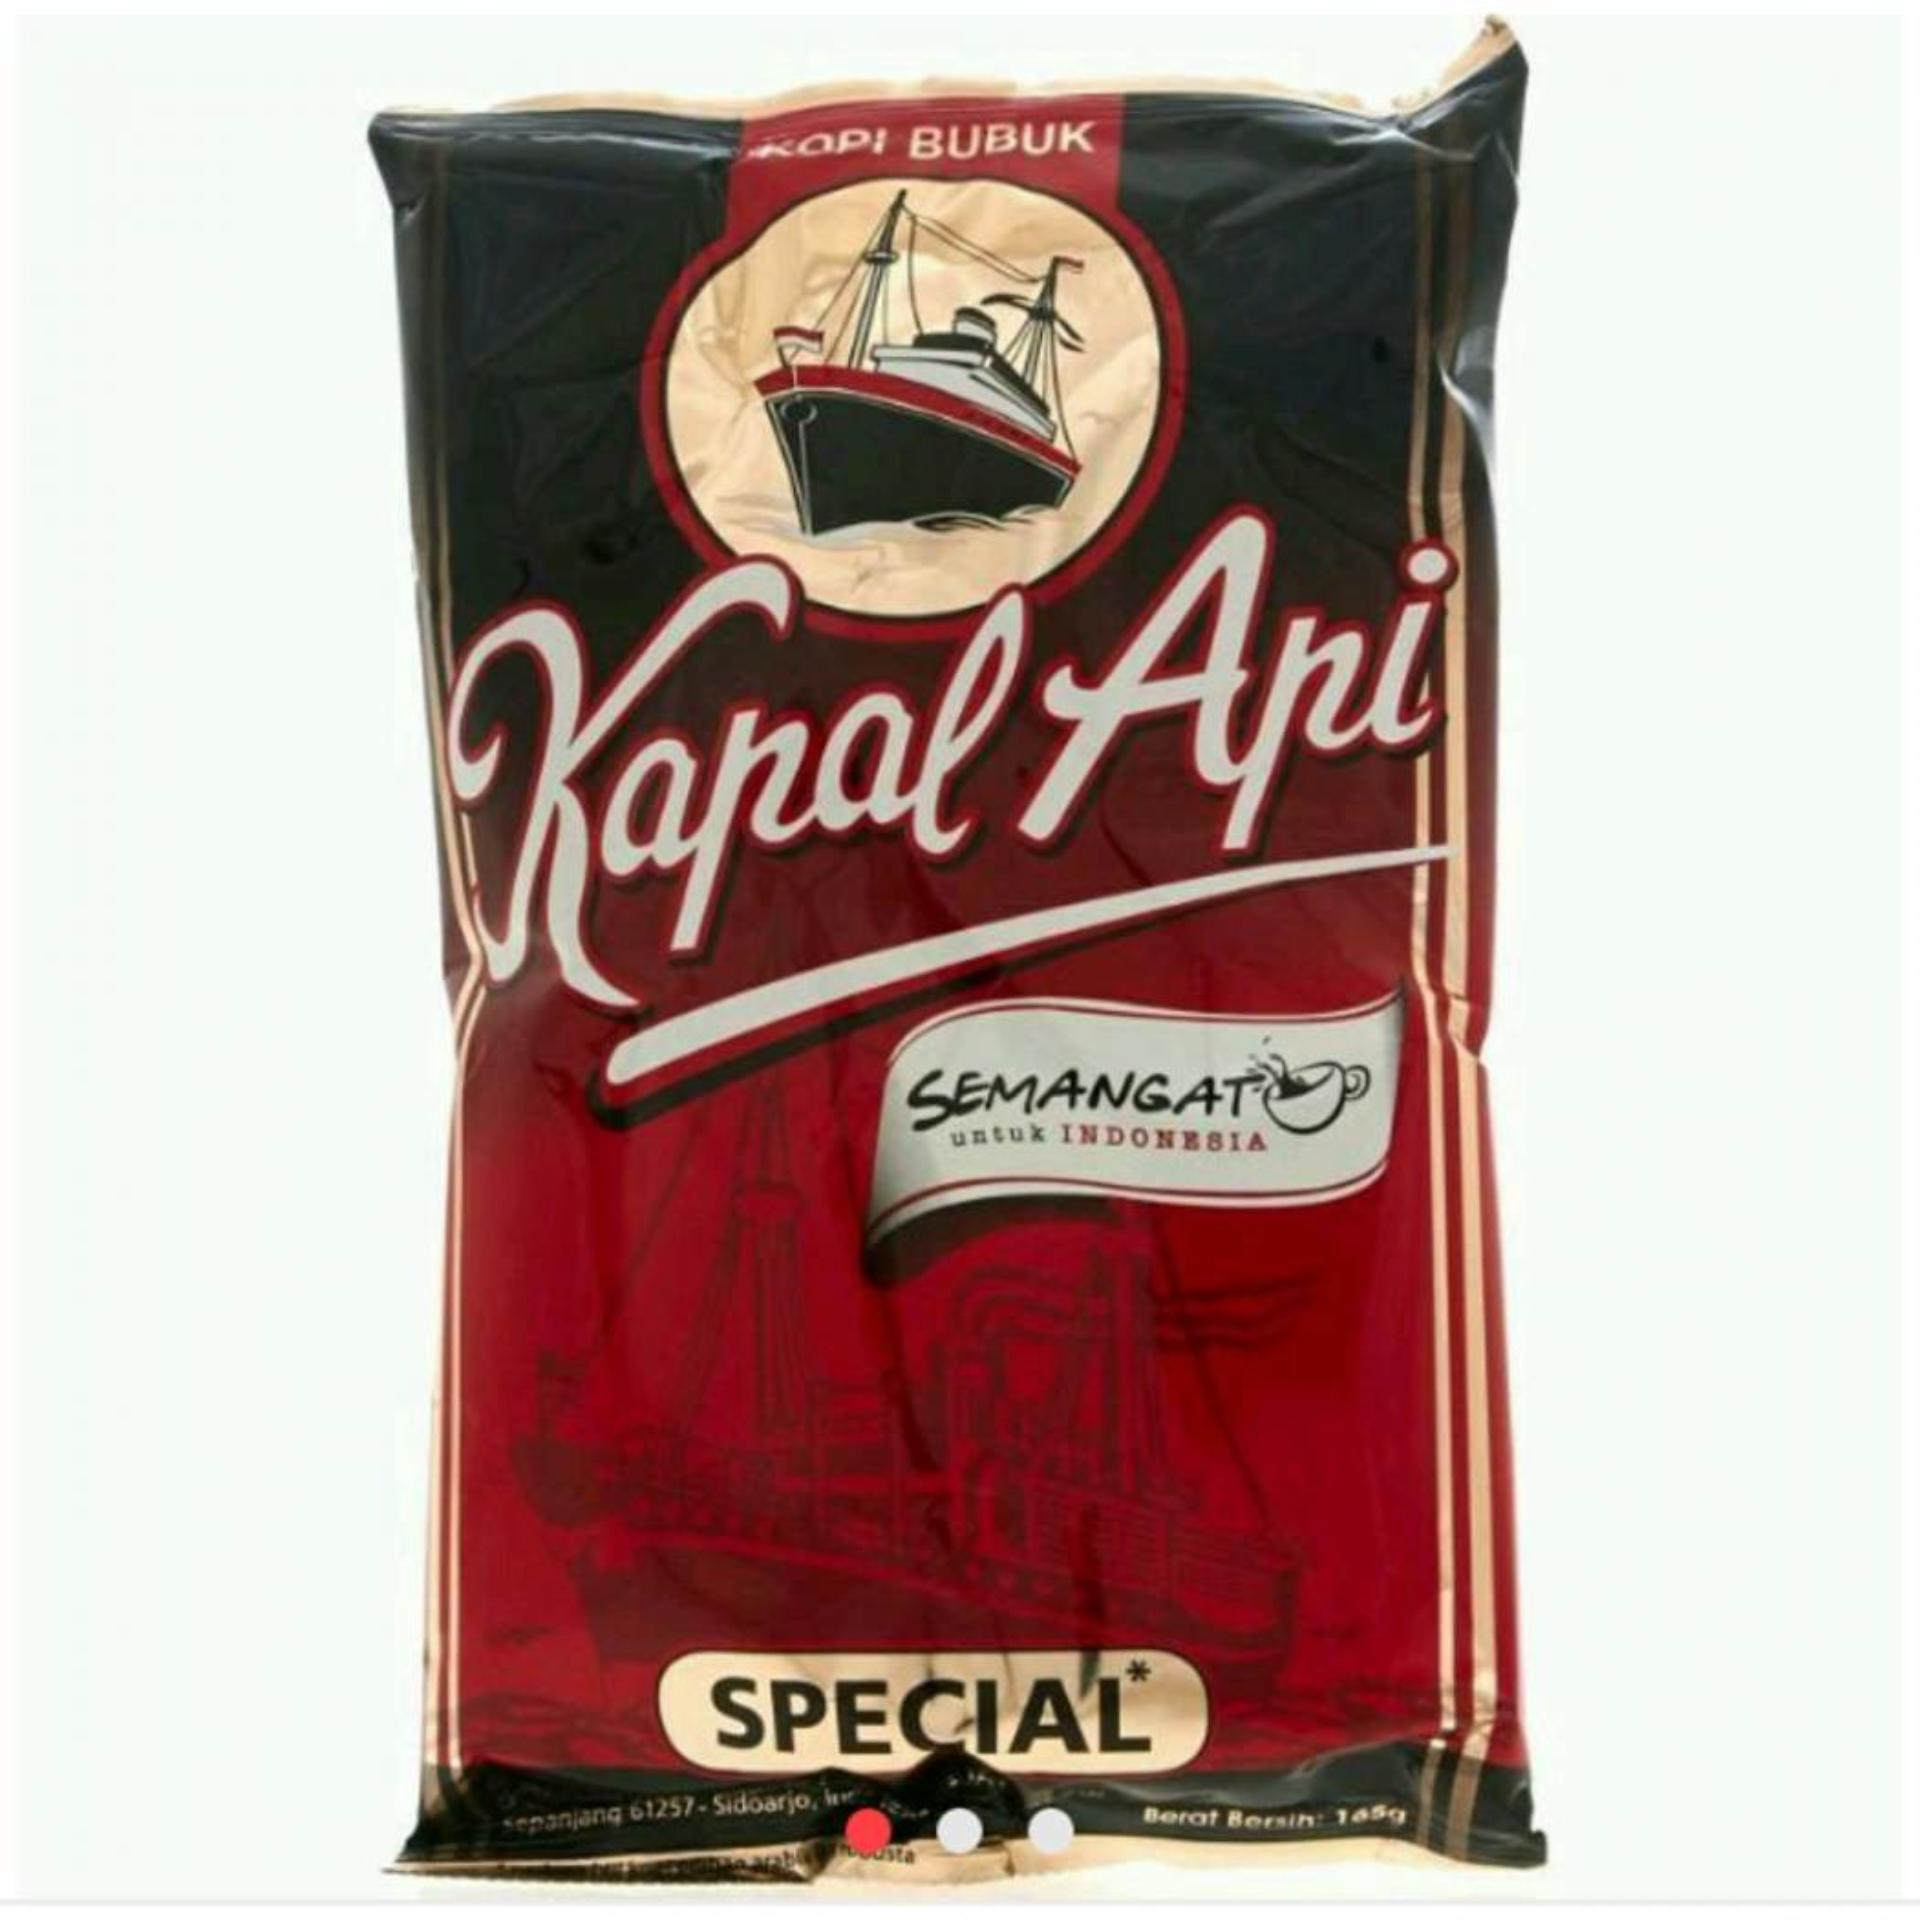 Kapal Api Kopi Special 165g